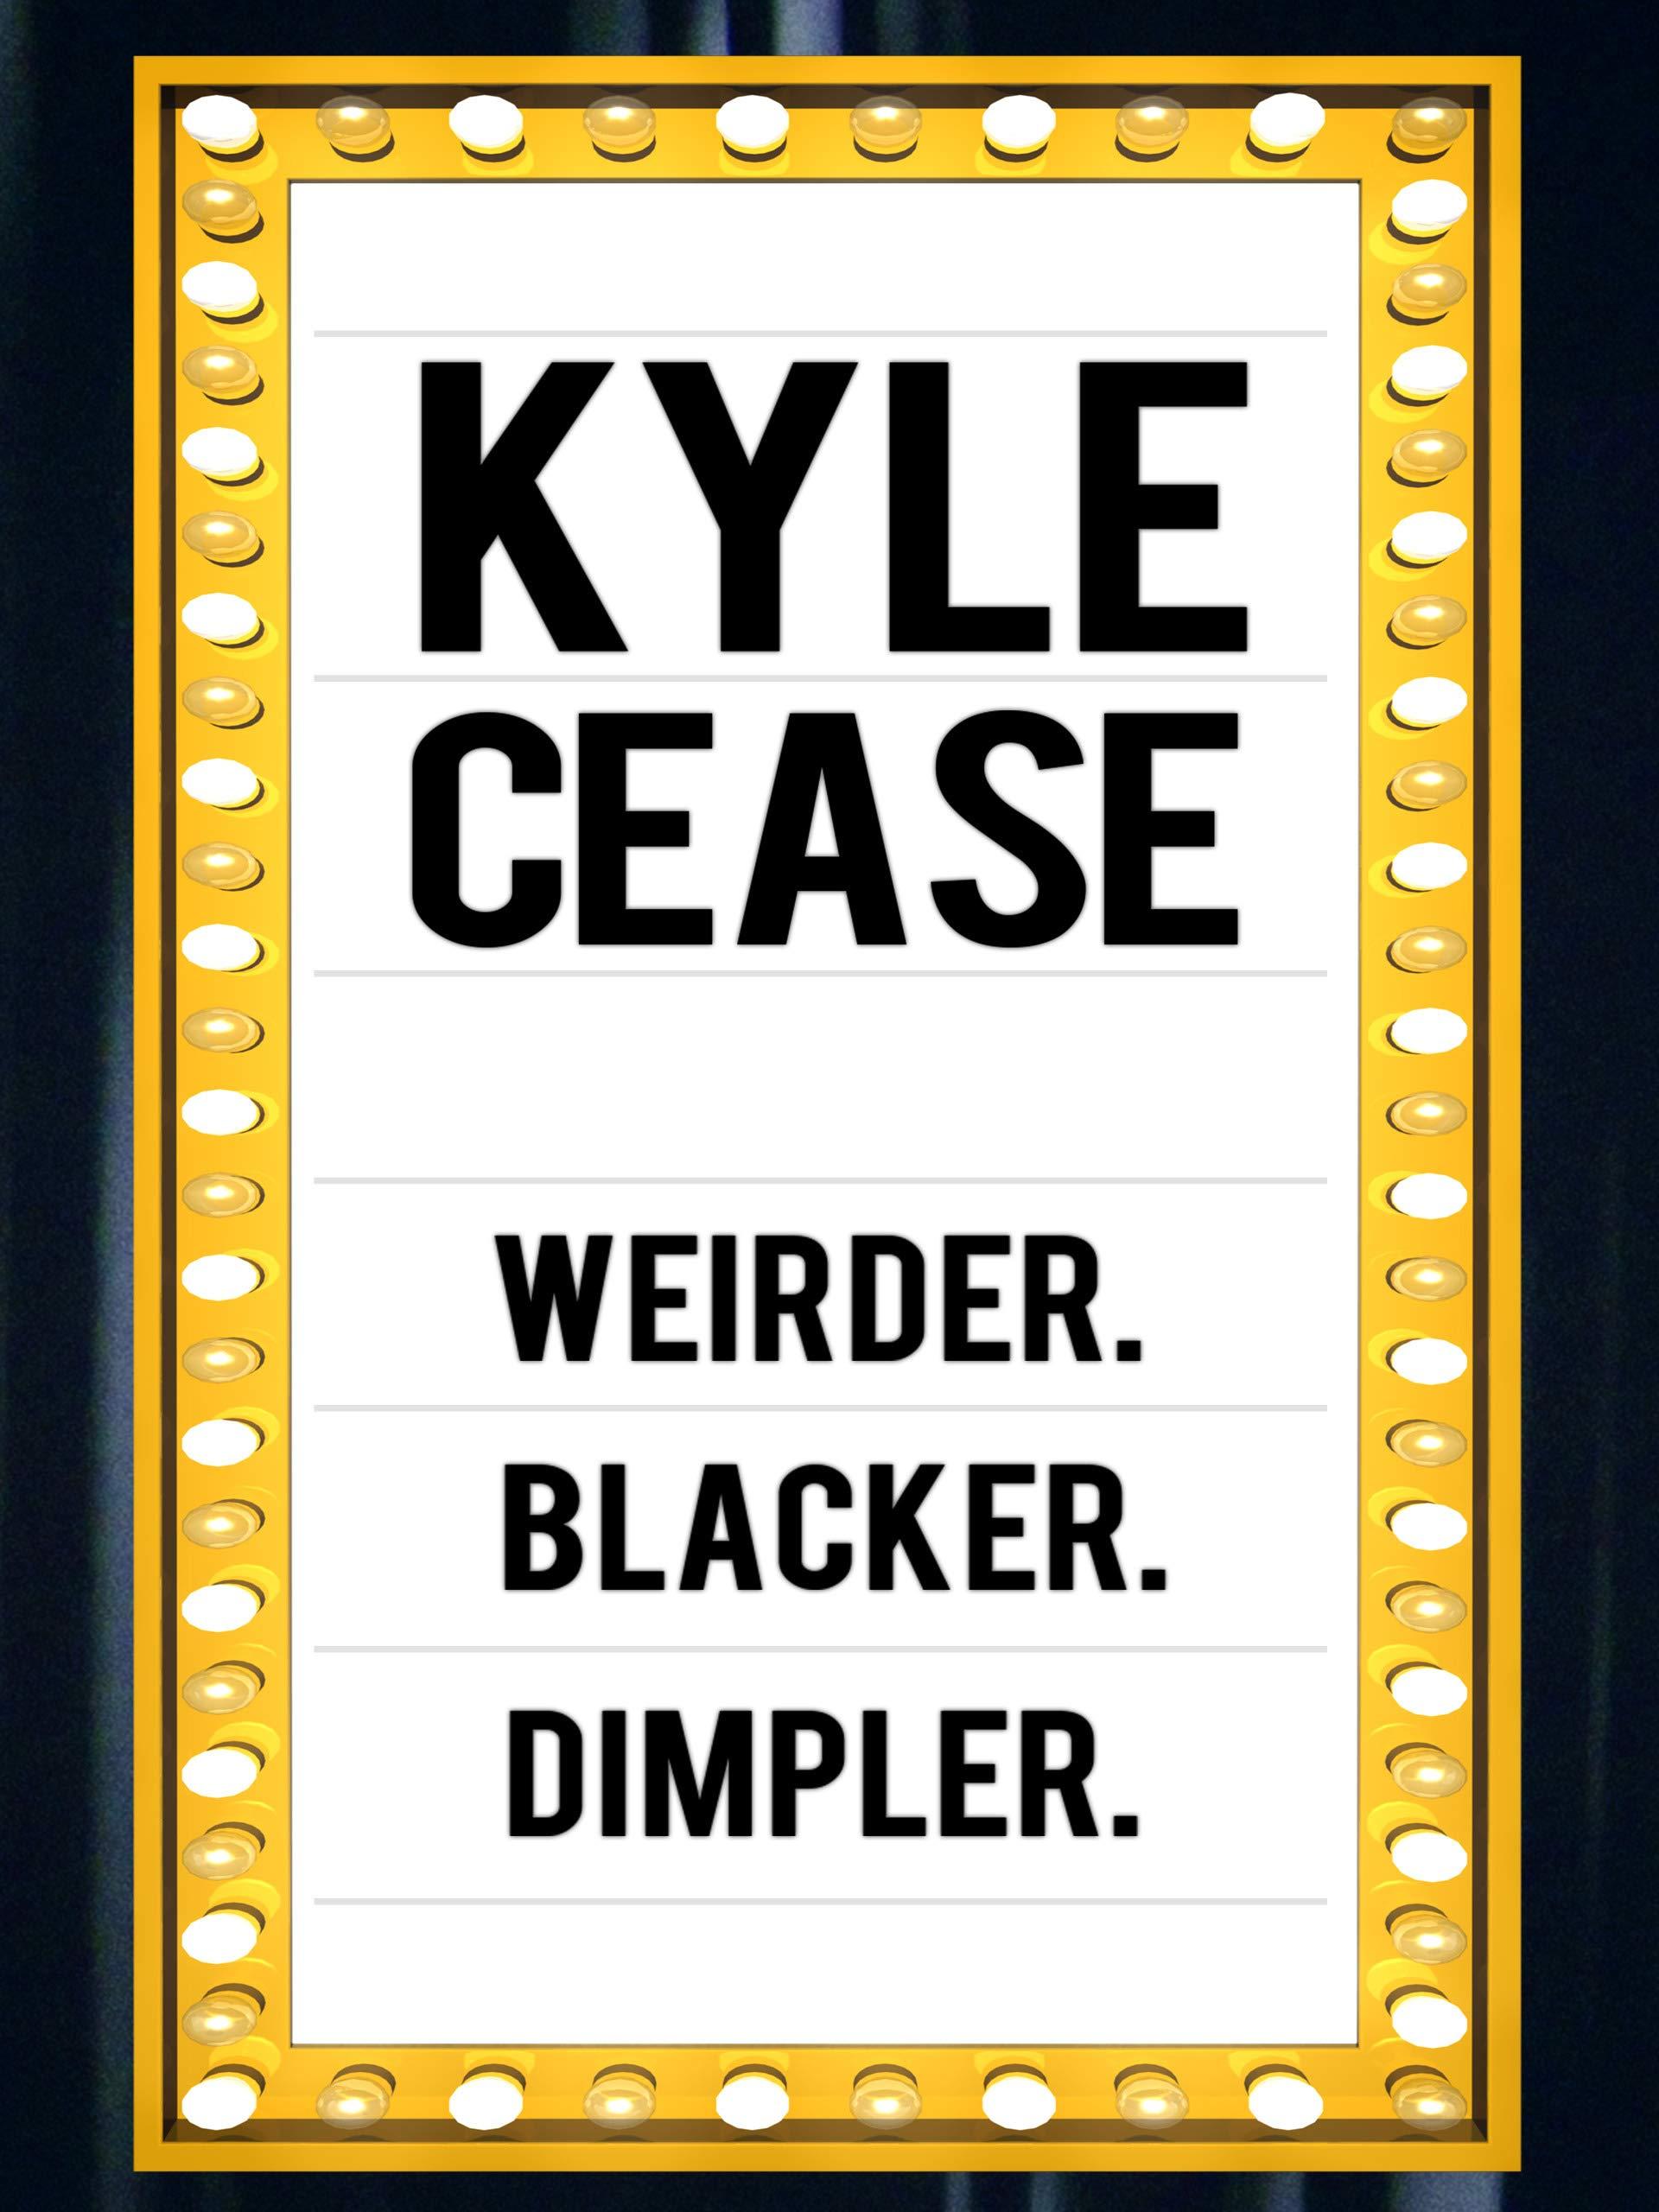 Kyle Cease: Weirder. Blacker. Dimpler.